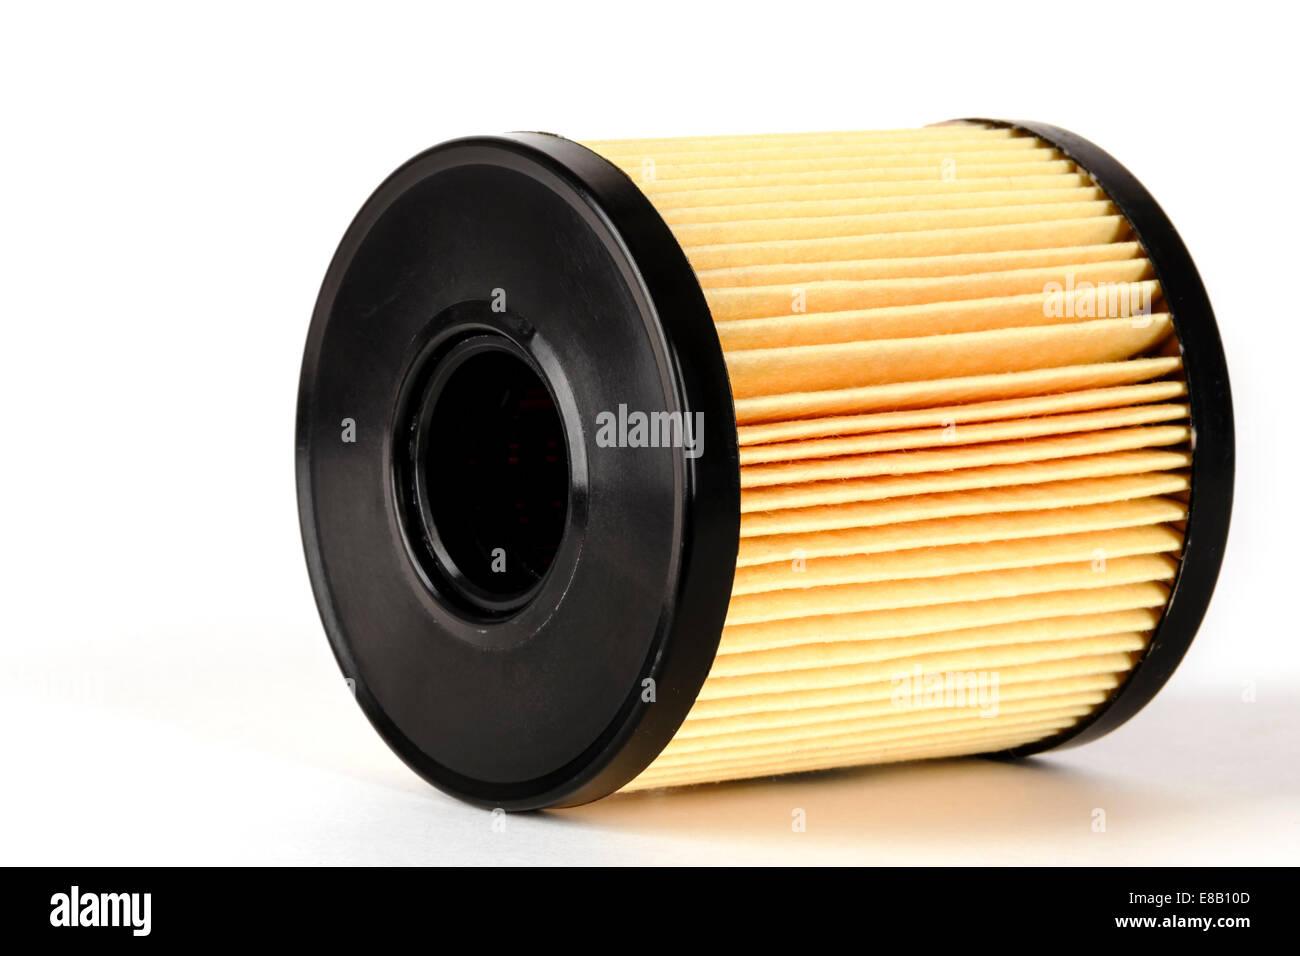 Oil filter element - Stock Image